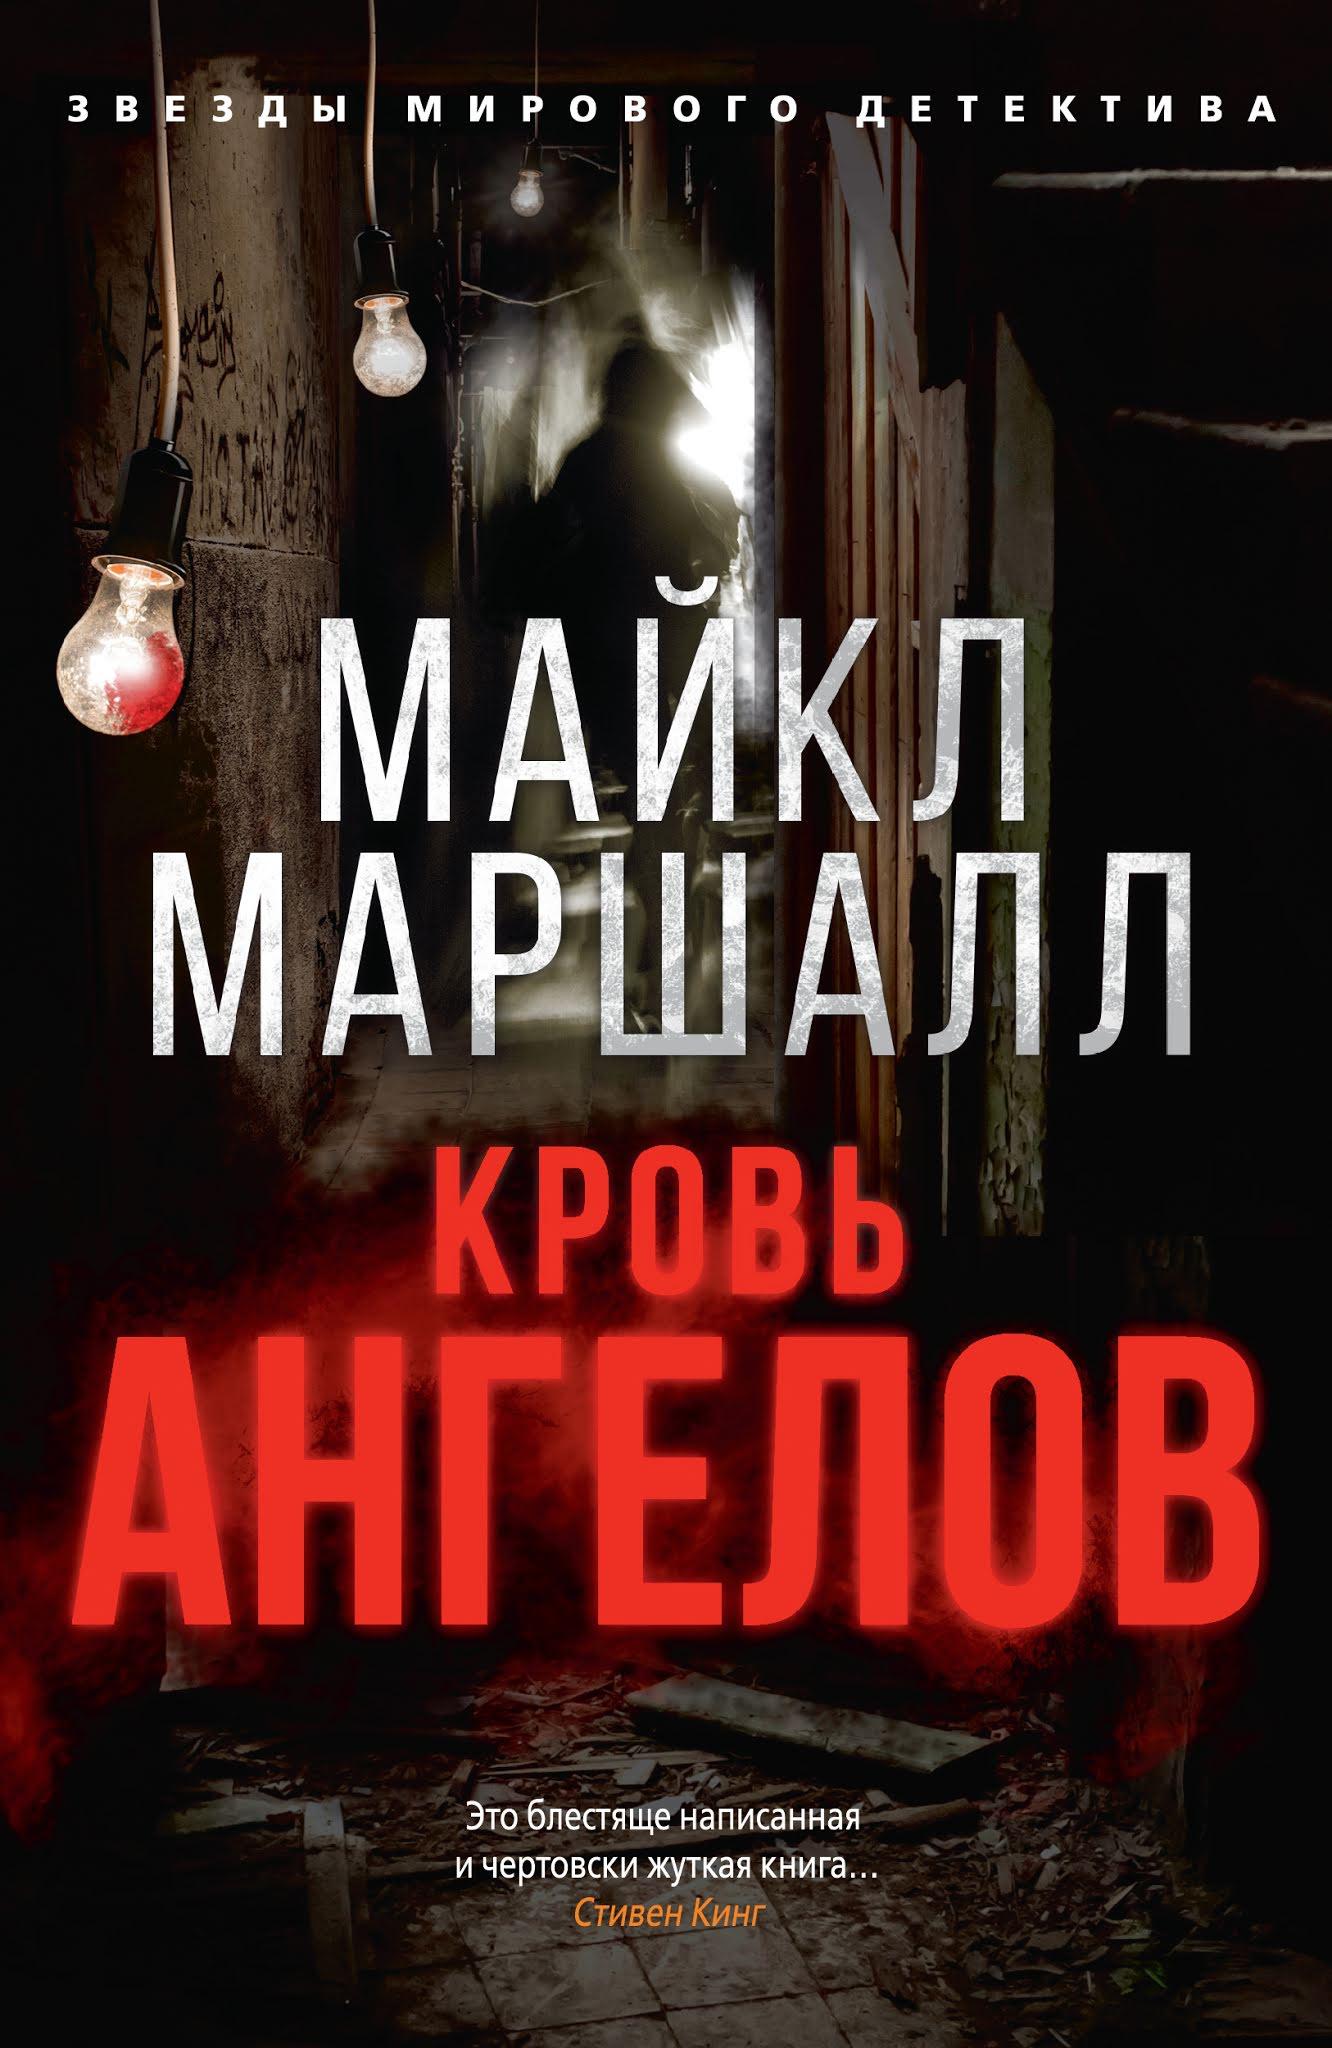 Майкл Маршалл — Кровь ангелов (2005)